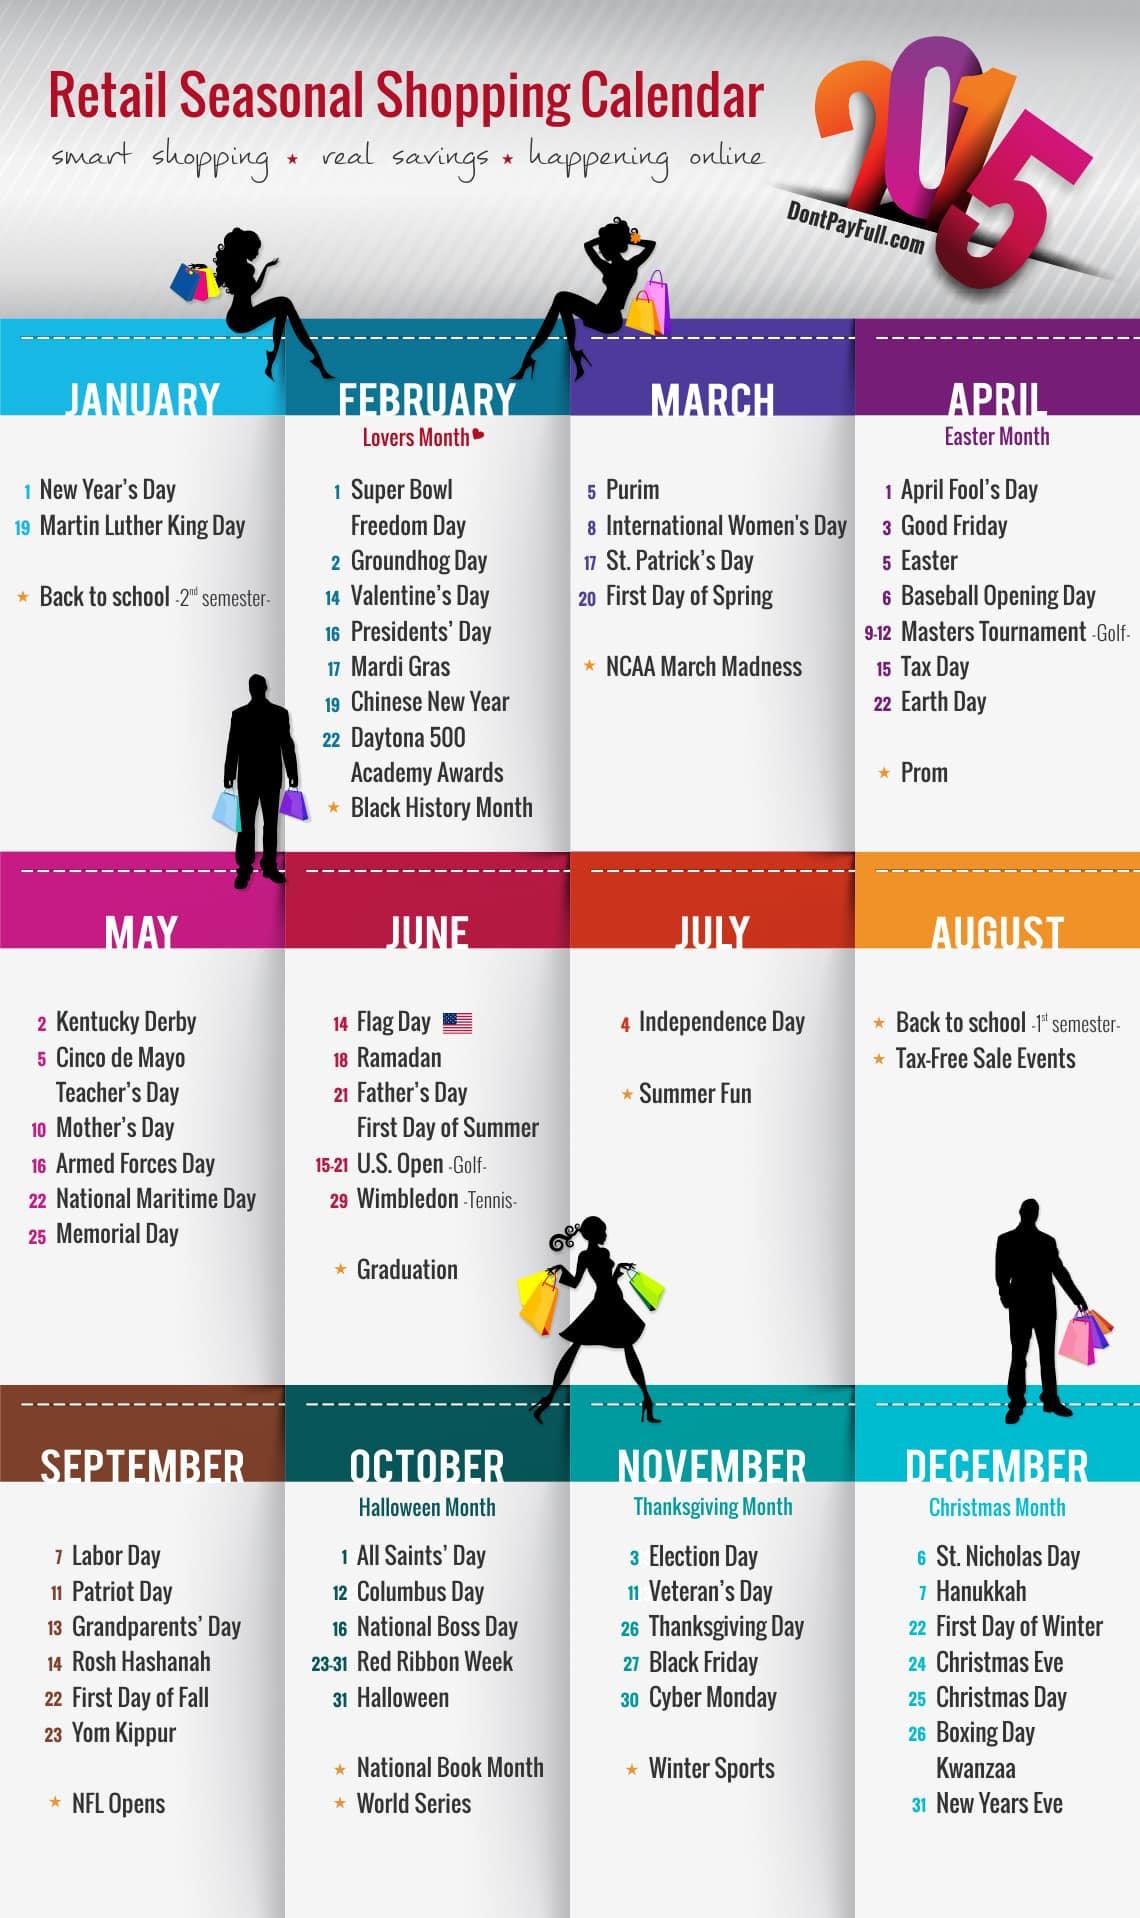 Retail Seasonal Shopping Calendar 2015